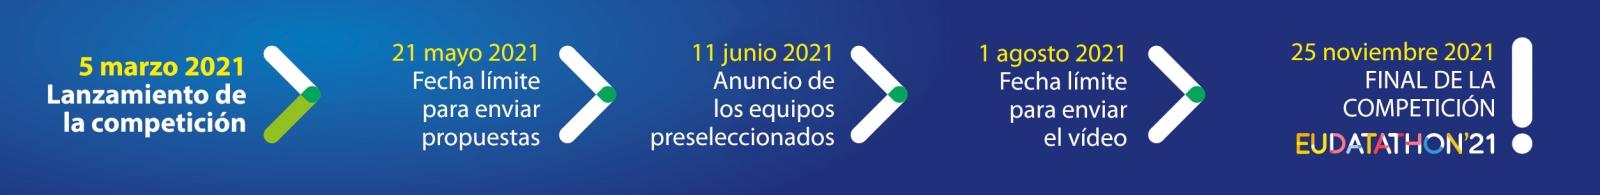 Calendario EU Datathon 2021